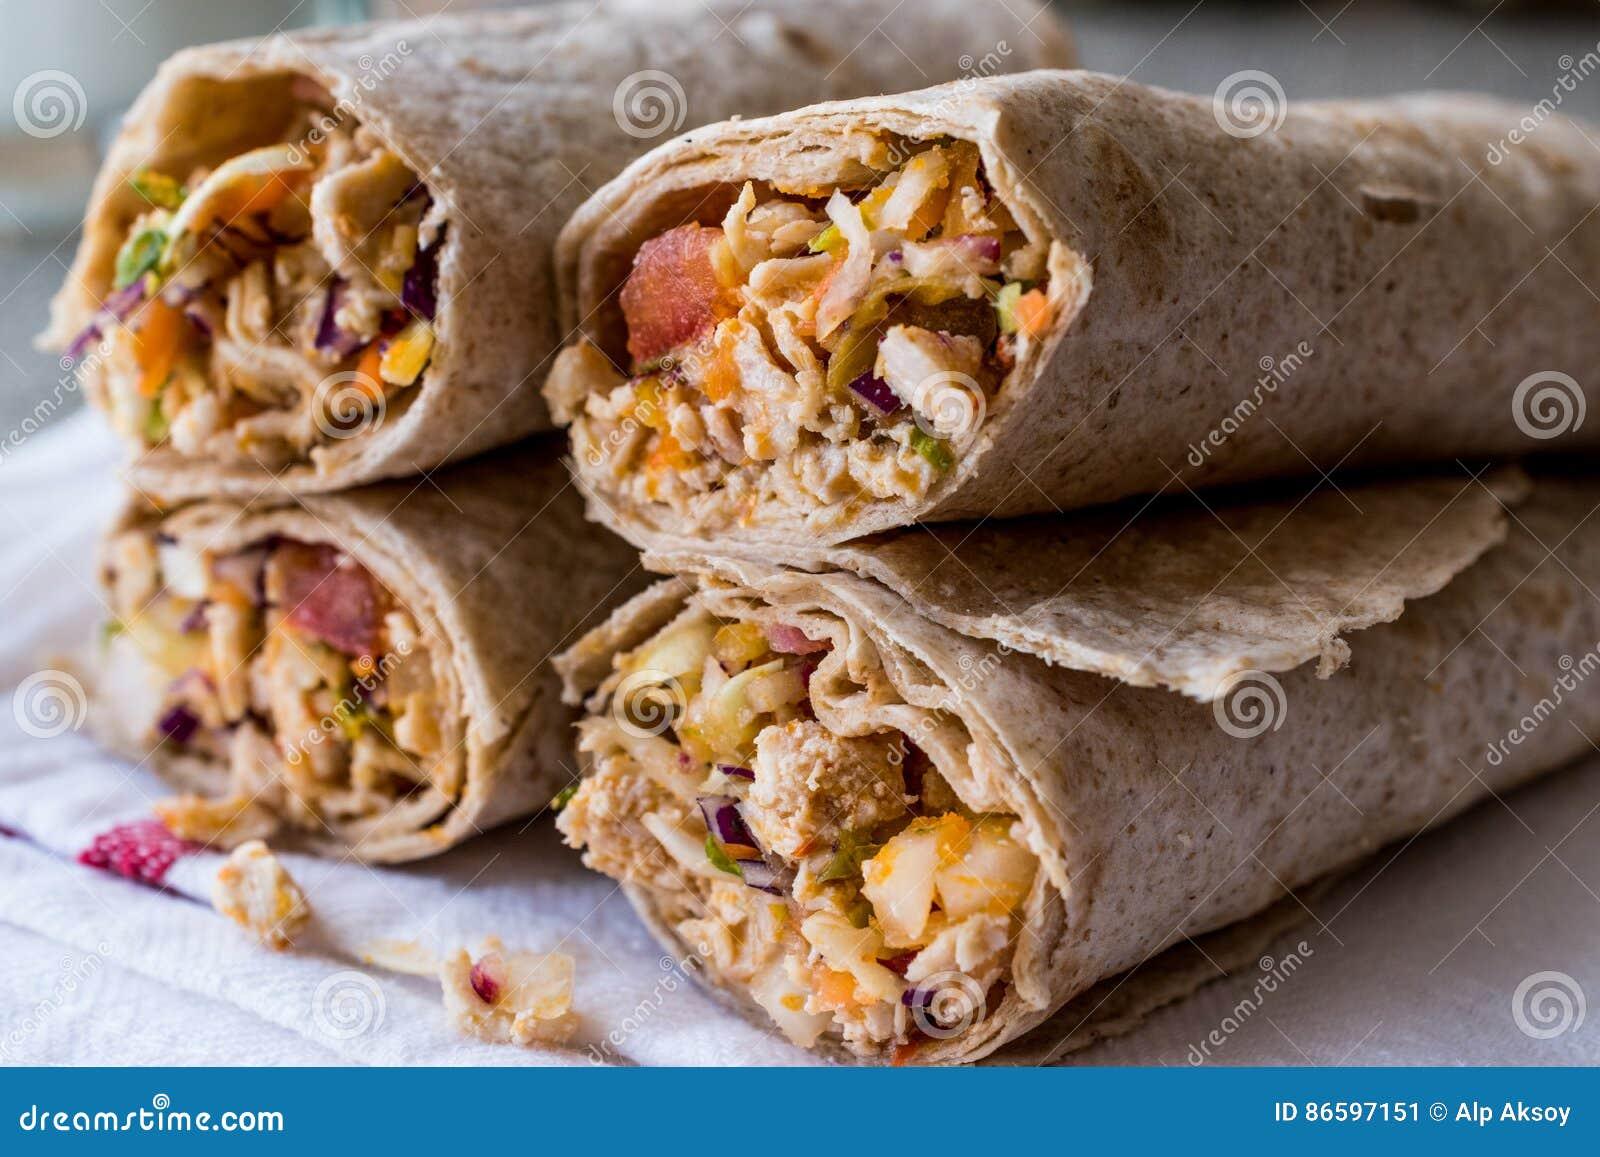 Chicken shawarma durum kebab with ayran or buttermilk / Tantuni